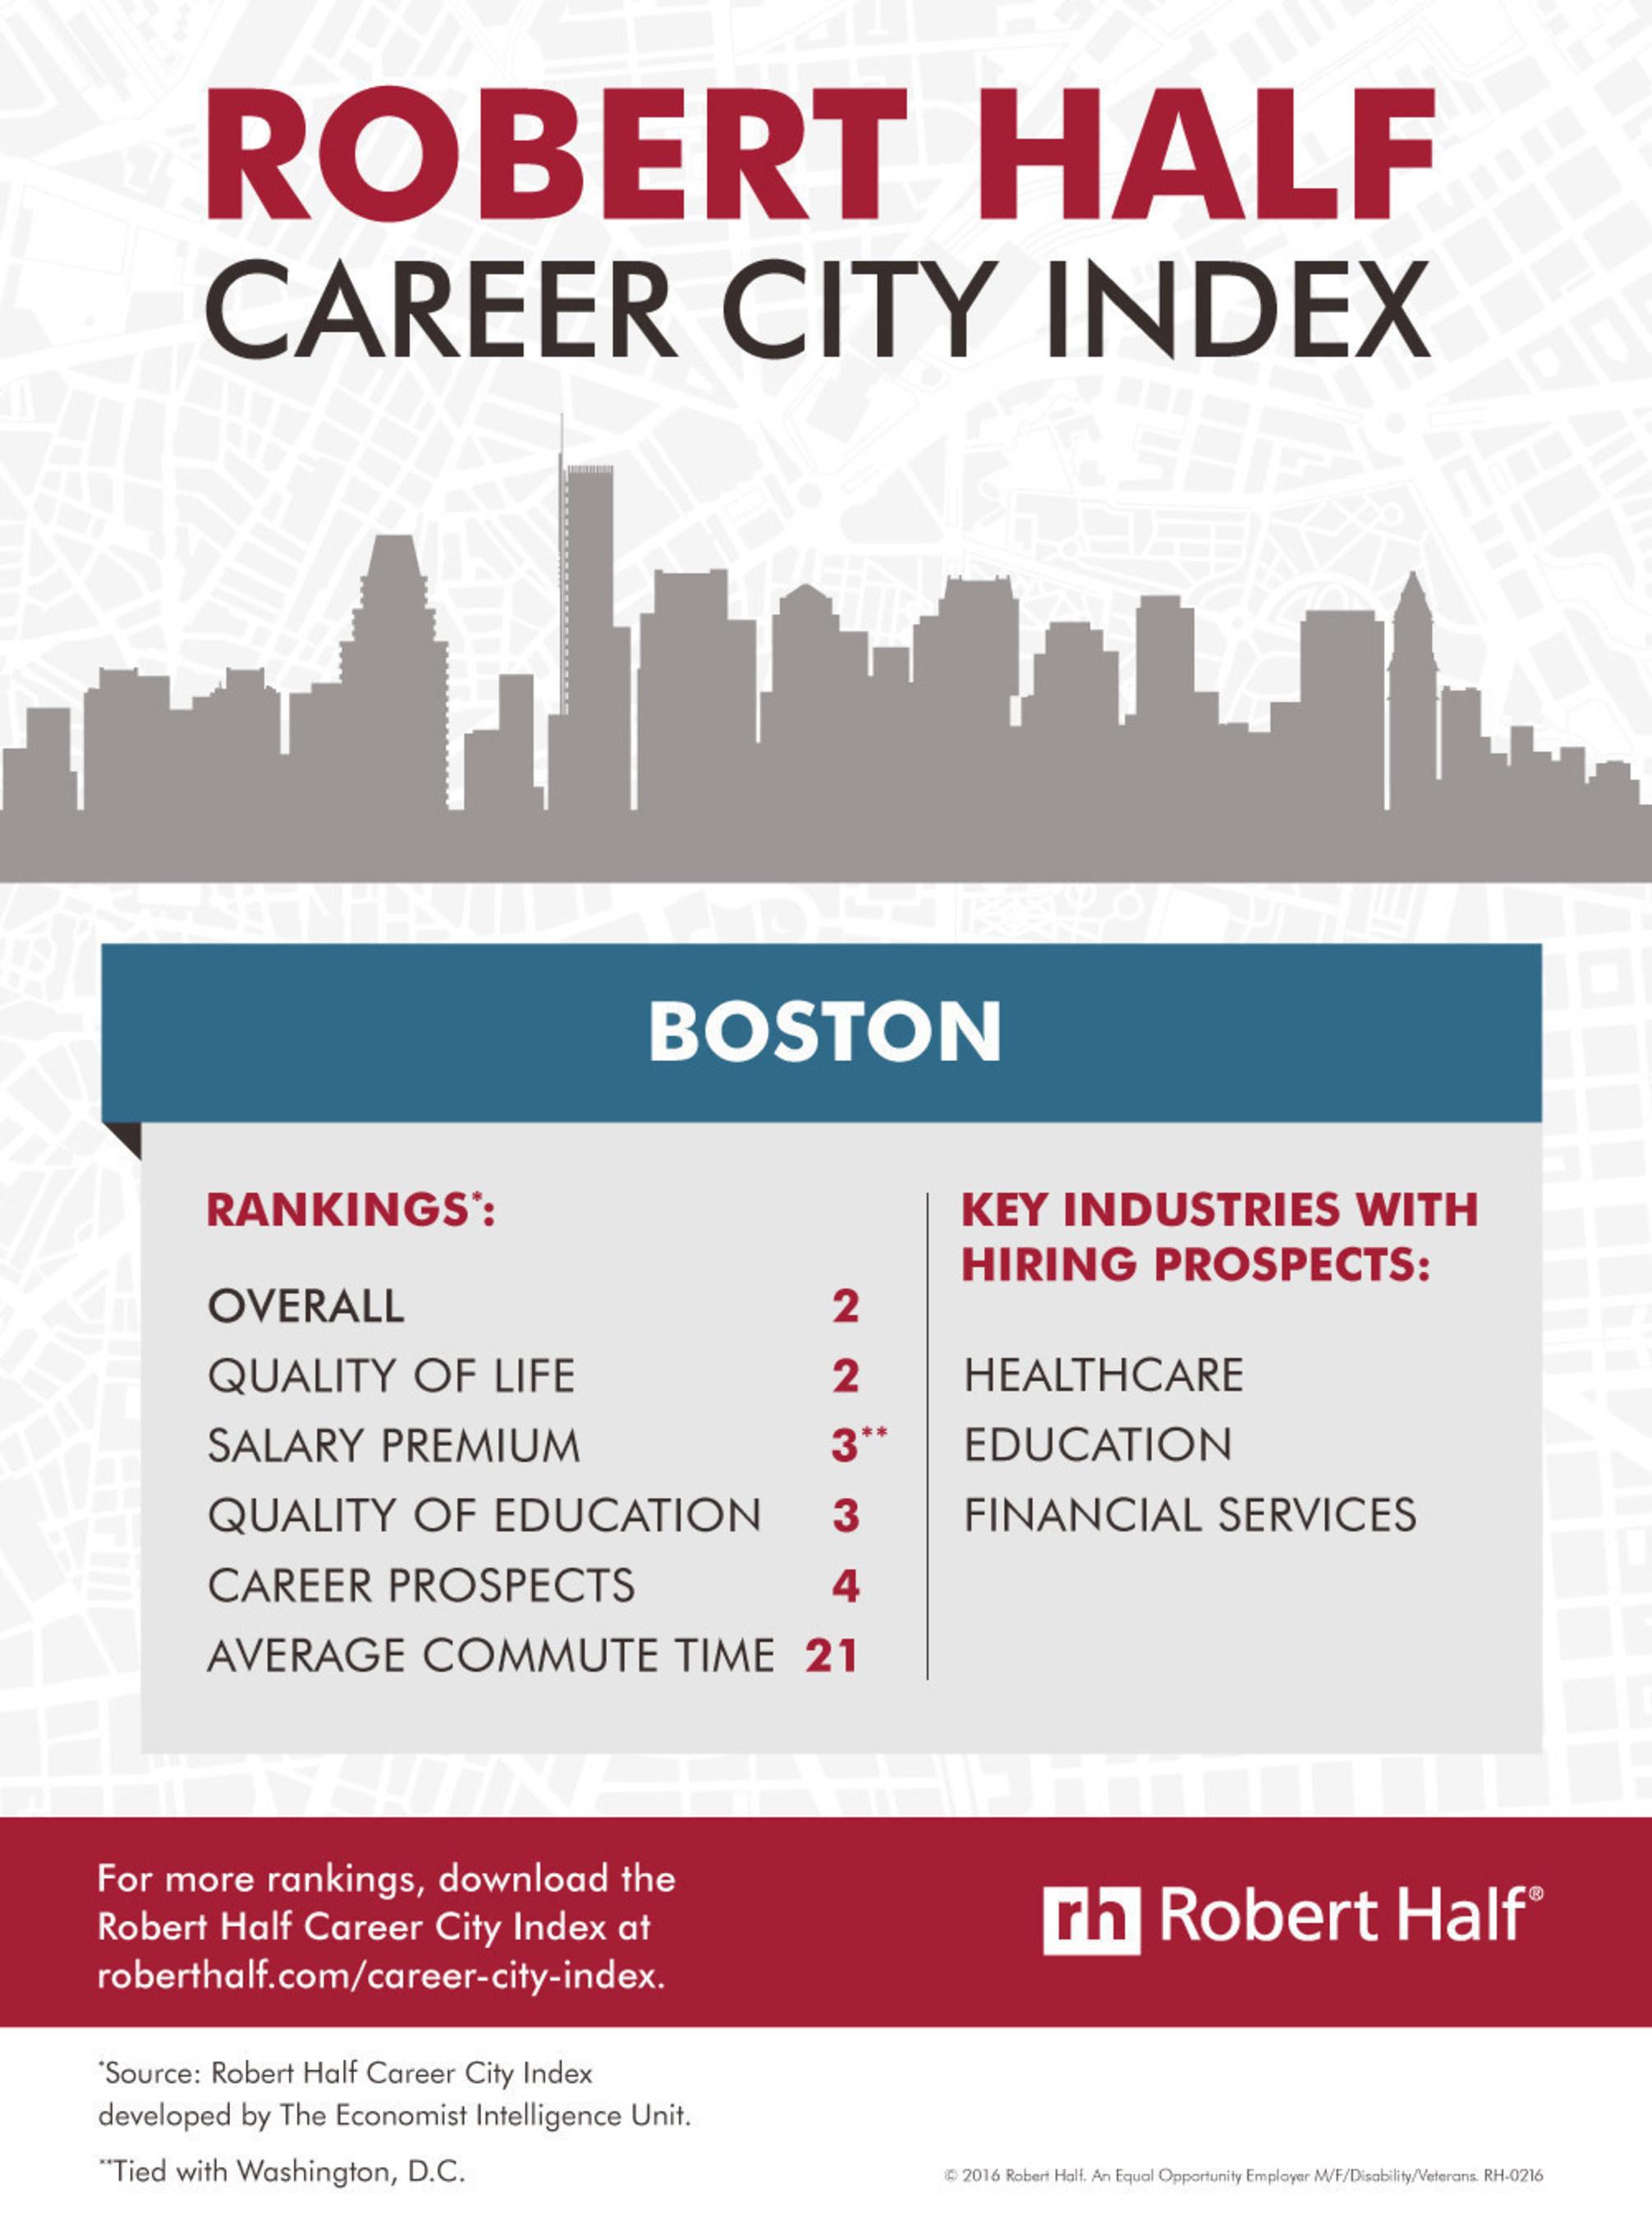 Boston Career City Index Rankings